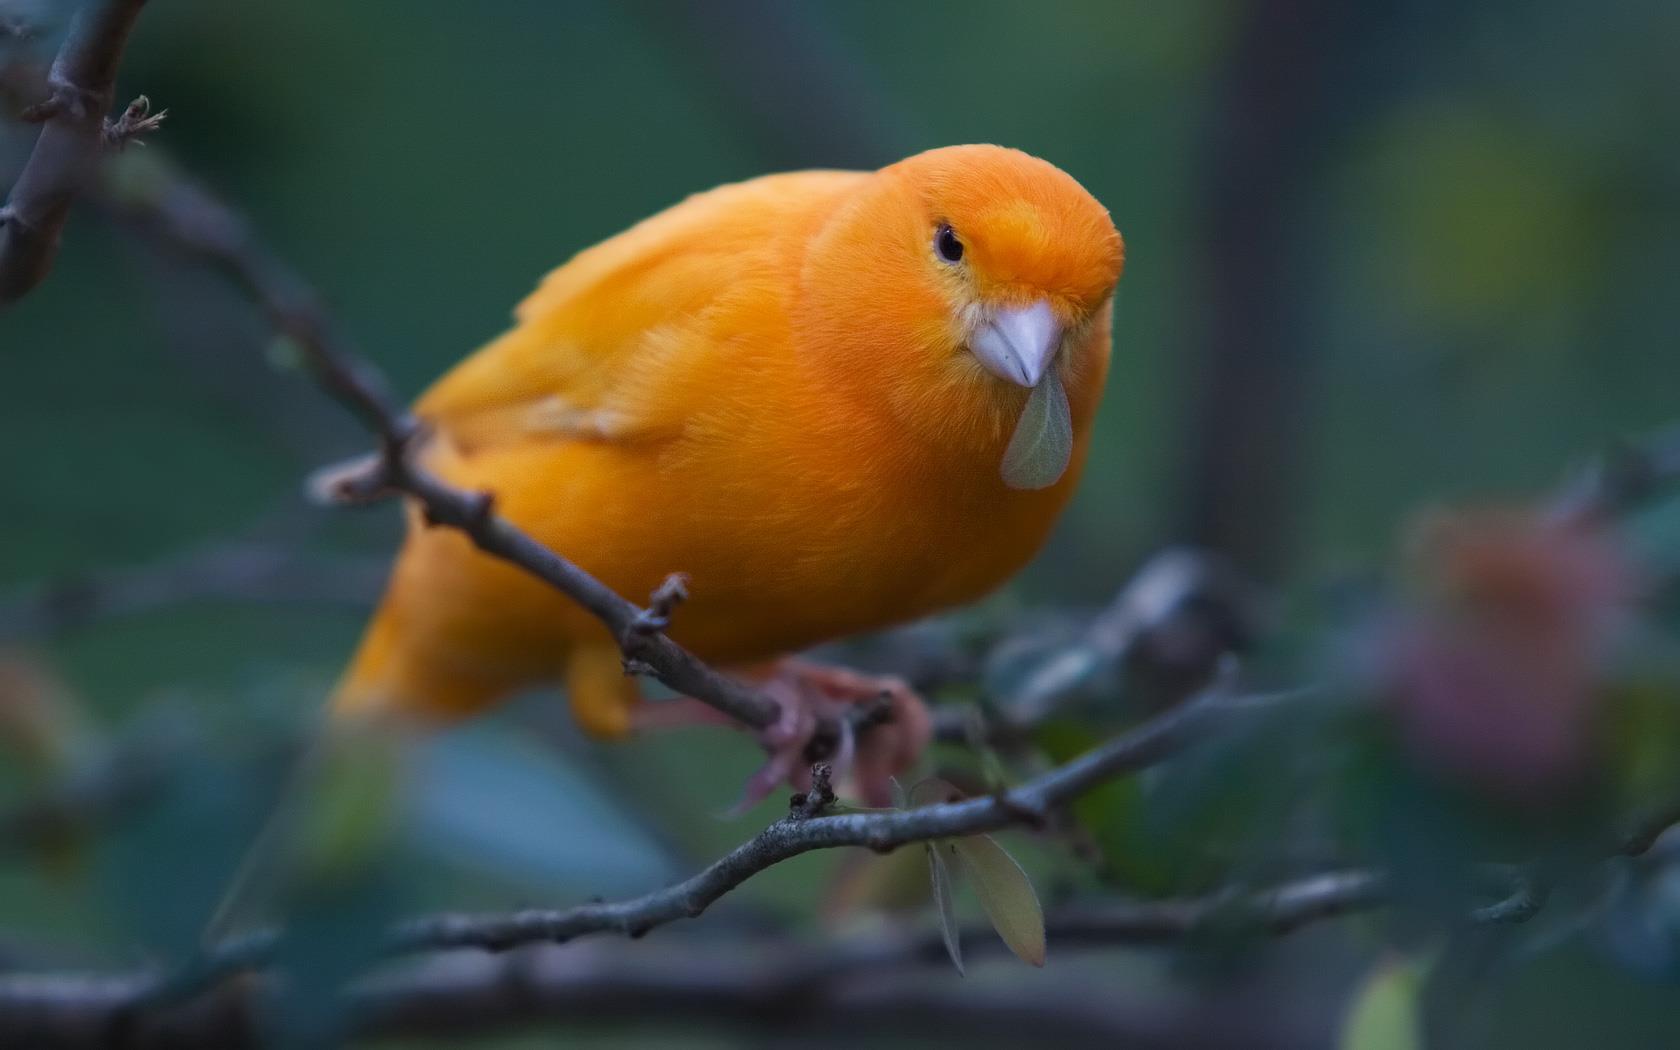 بالصور صور عصافير , اجمل صور عصافير ملونه 5696 9